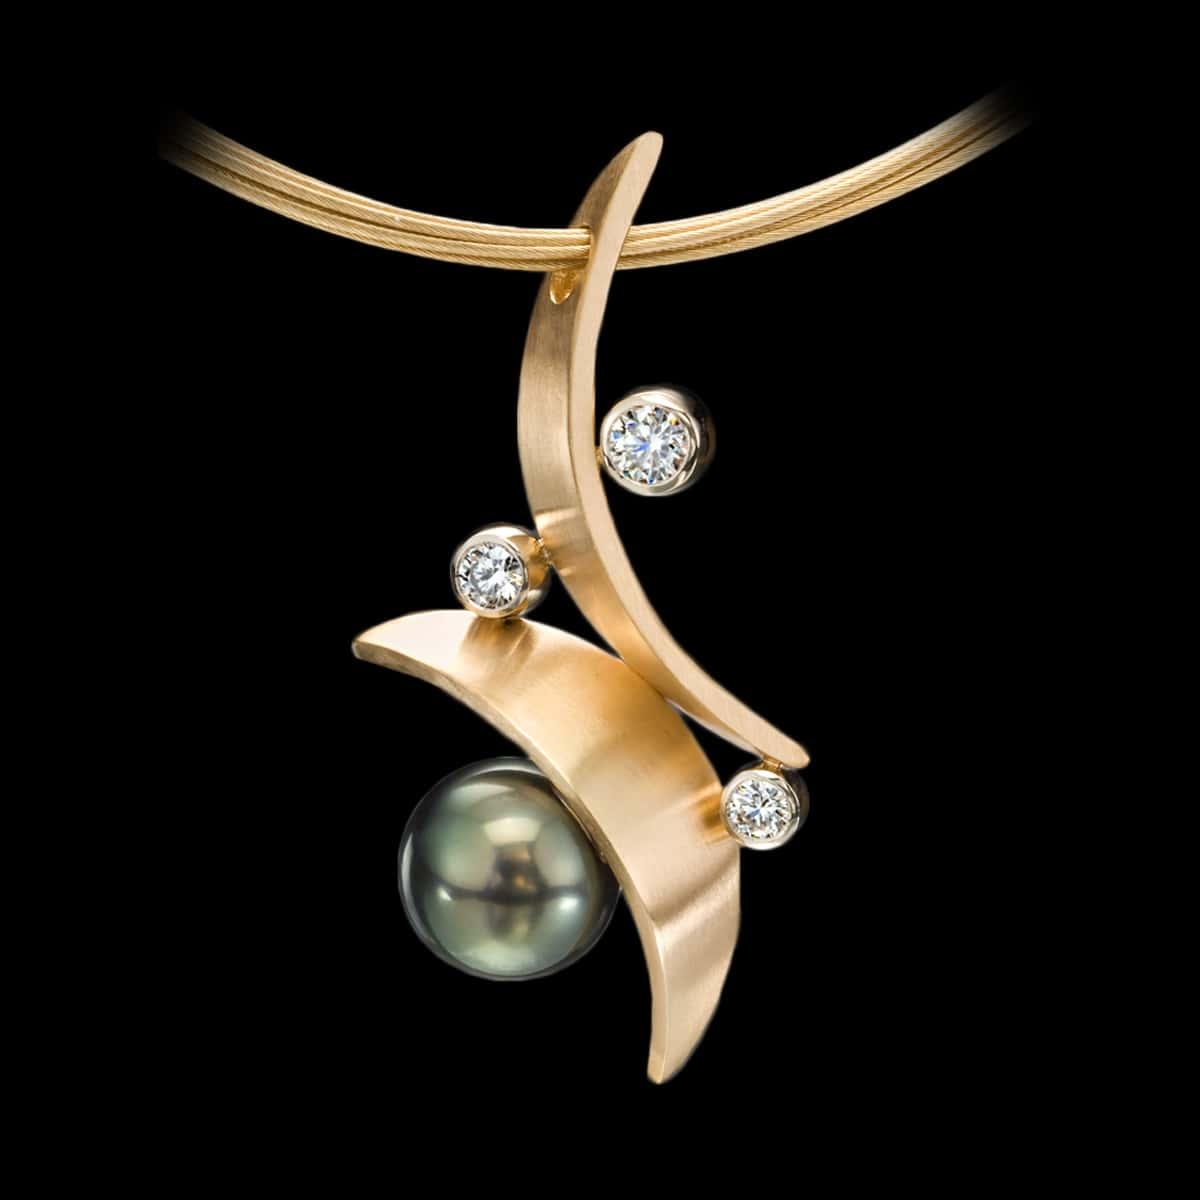 Flamenco tahitian pearl pendant